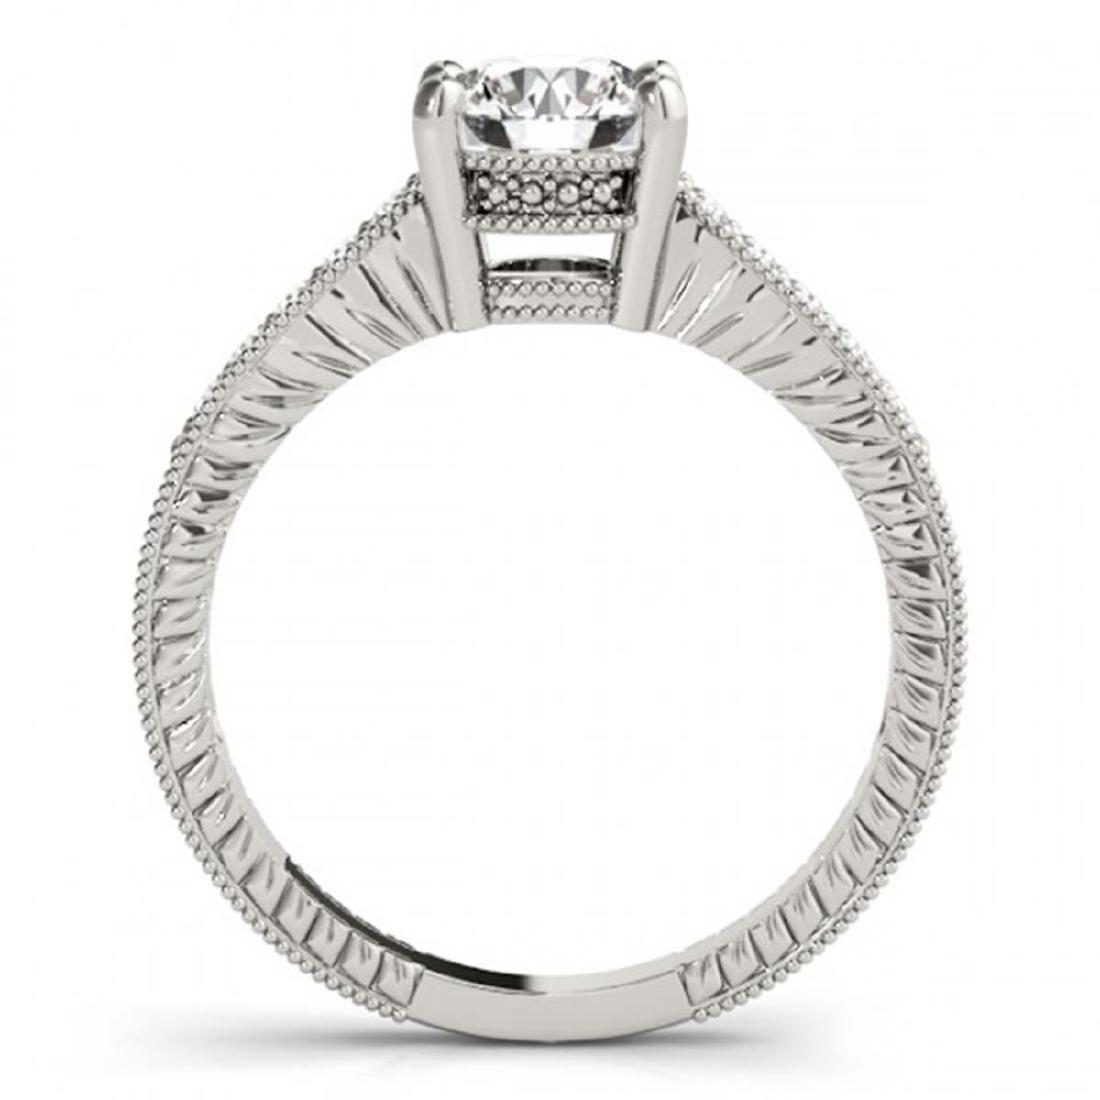 0.70 ctw VS/SI Diamond Ring 18K White Gold - REF-98M9F - 2